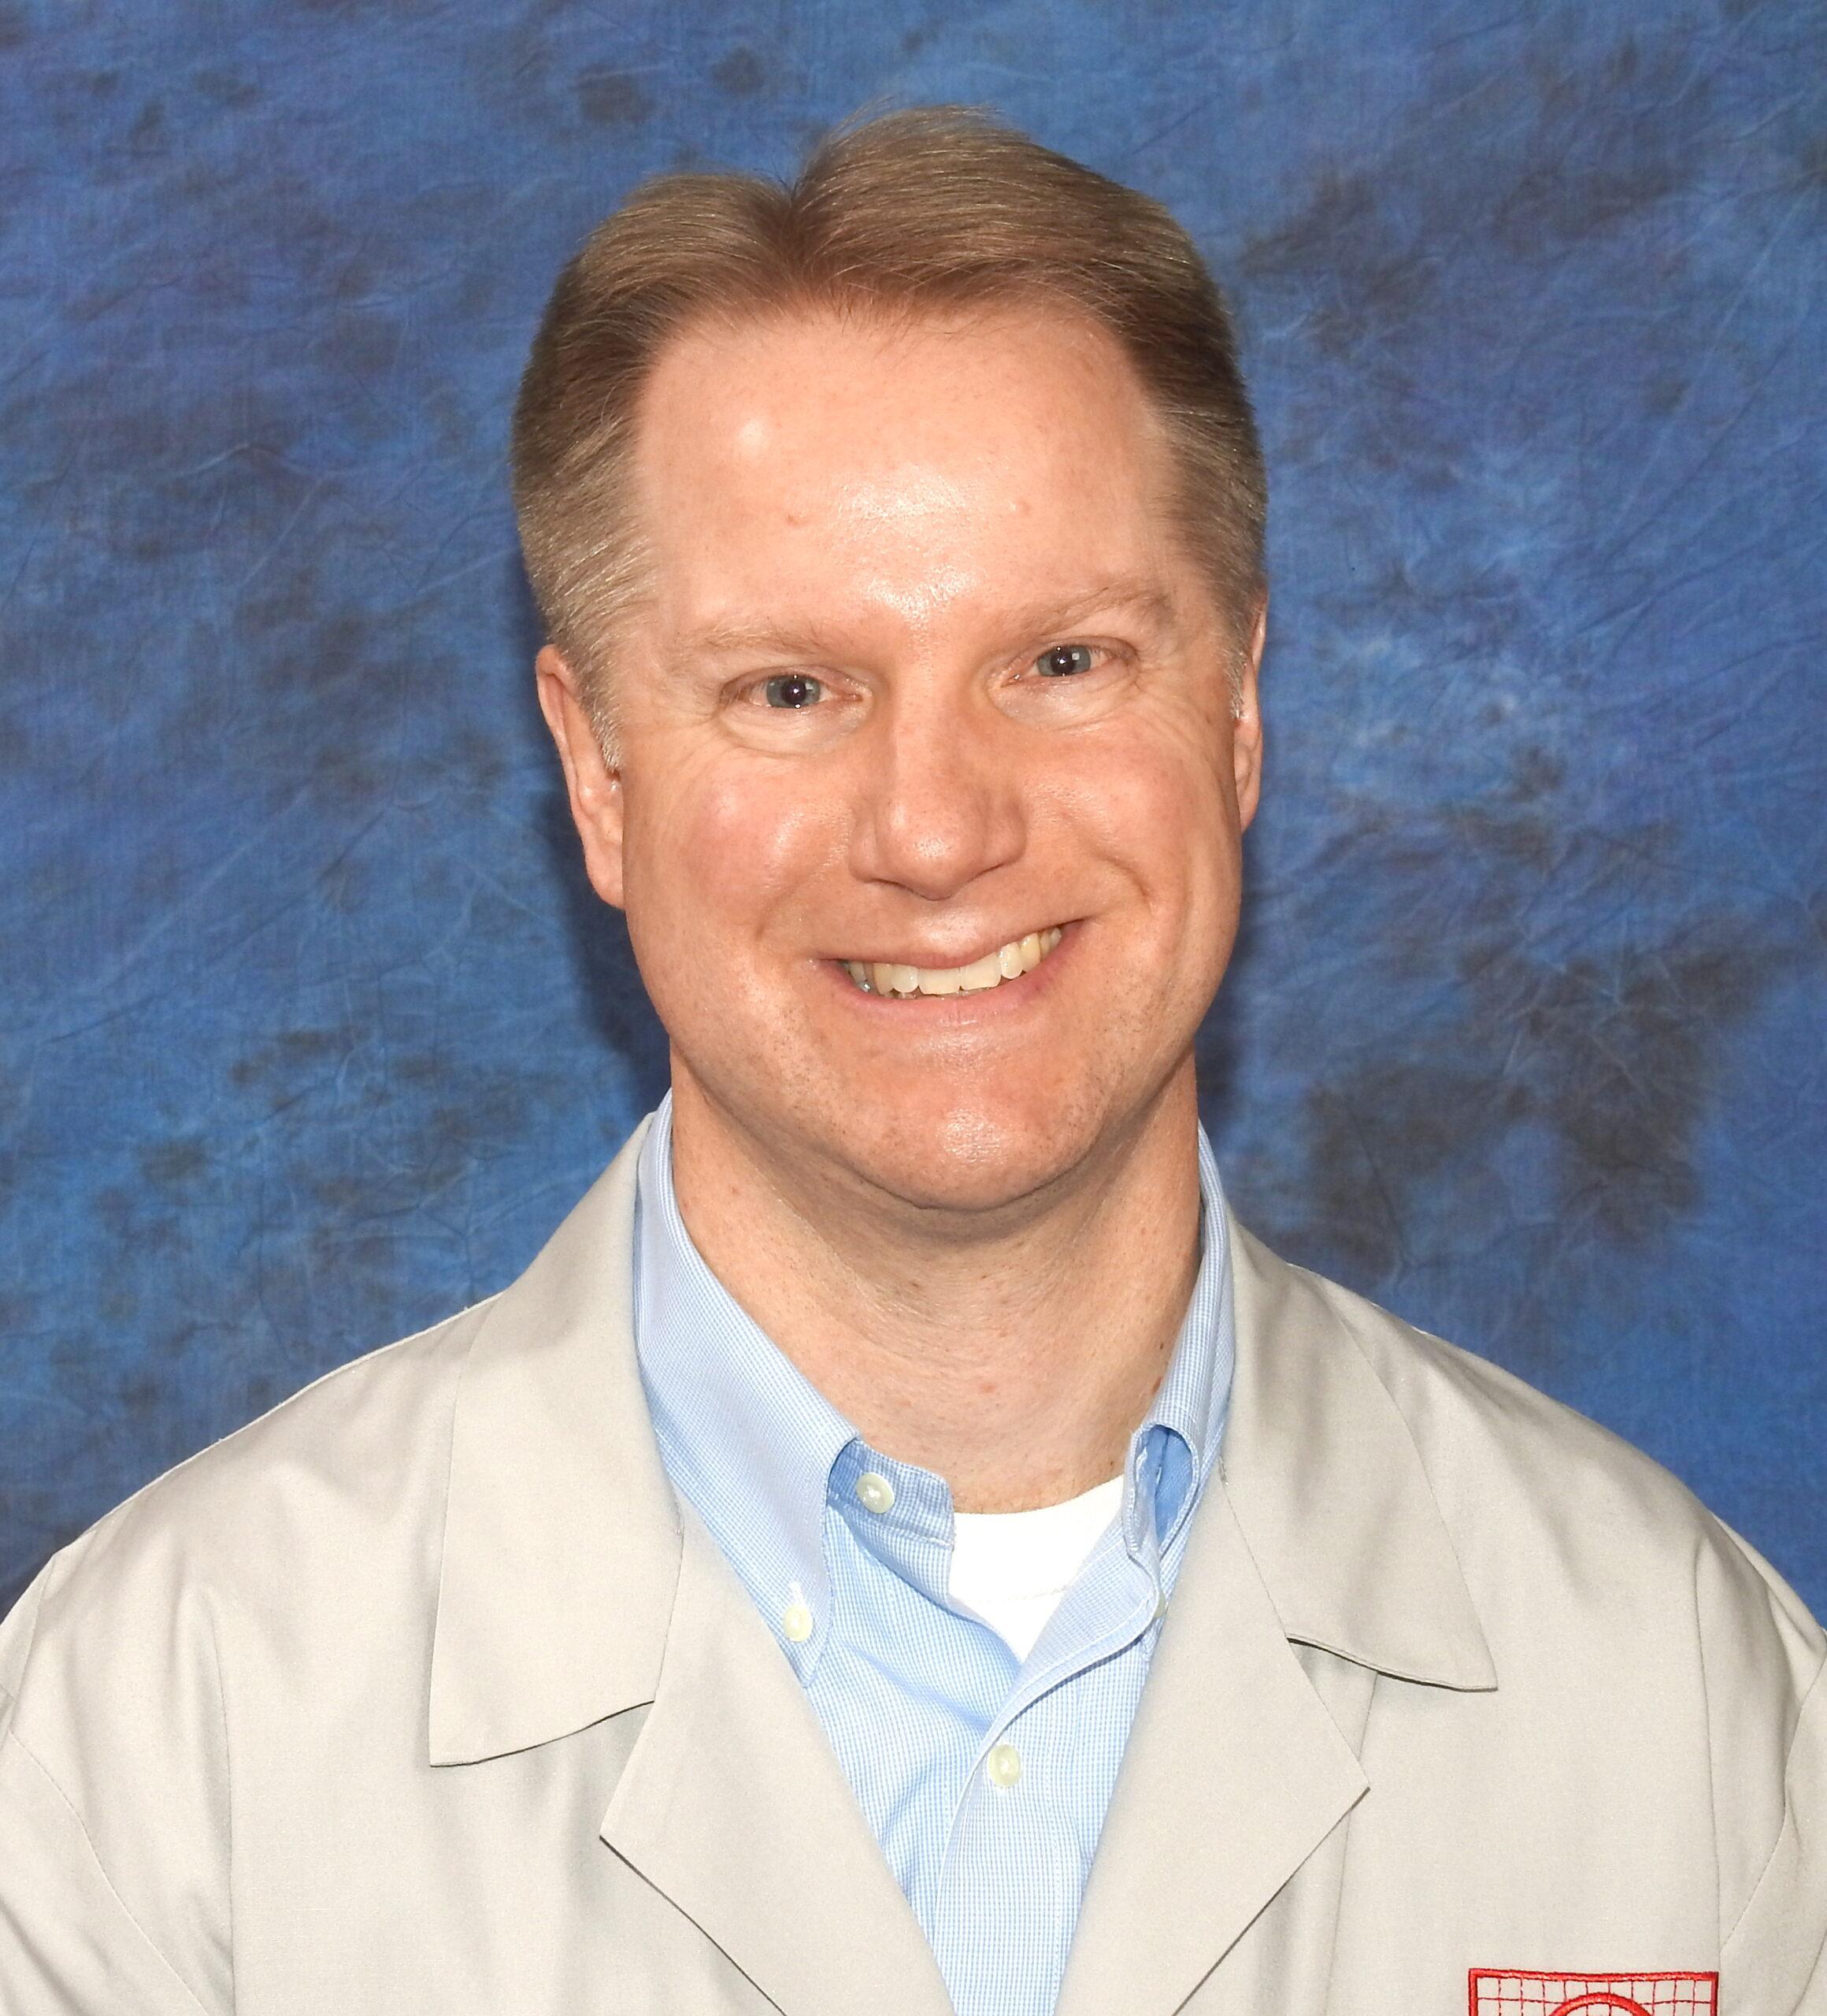 Joseph M. Weber, MD